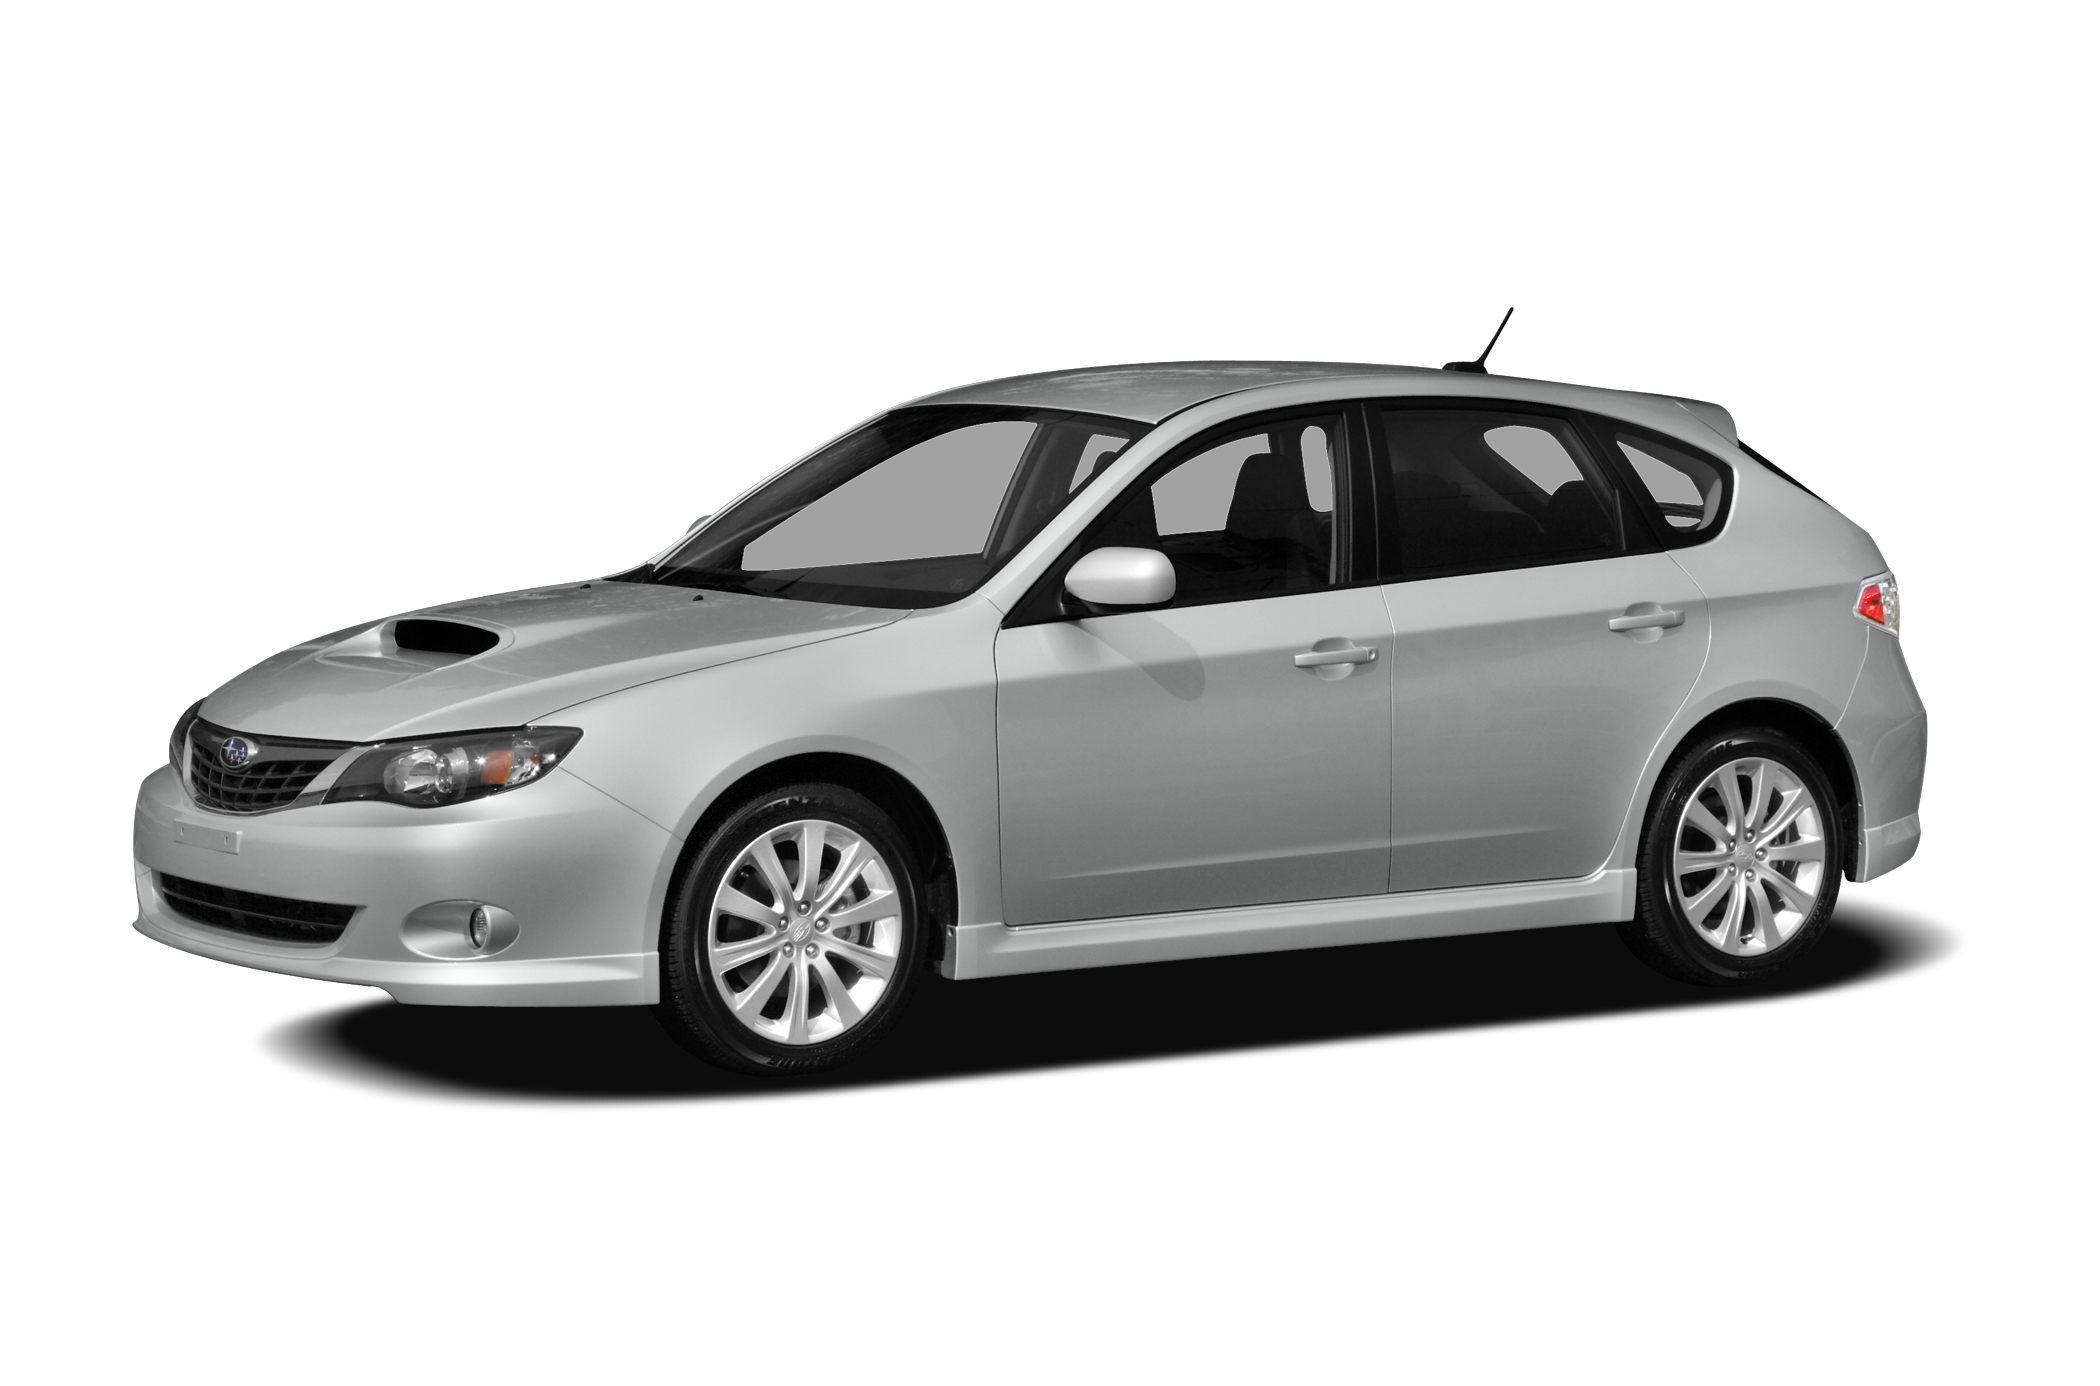 2008 Subaru Impreza WRX Miles 86645Color Spark Silver Metallic Stock 17011 VIN JF1GH75638G81